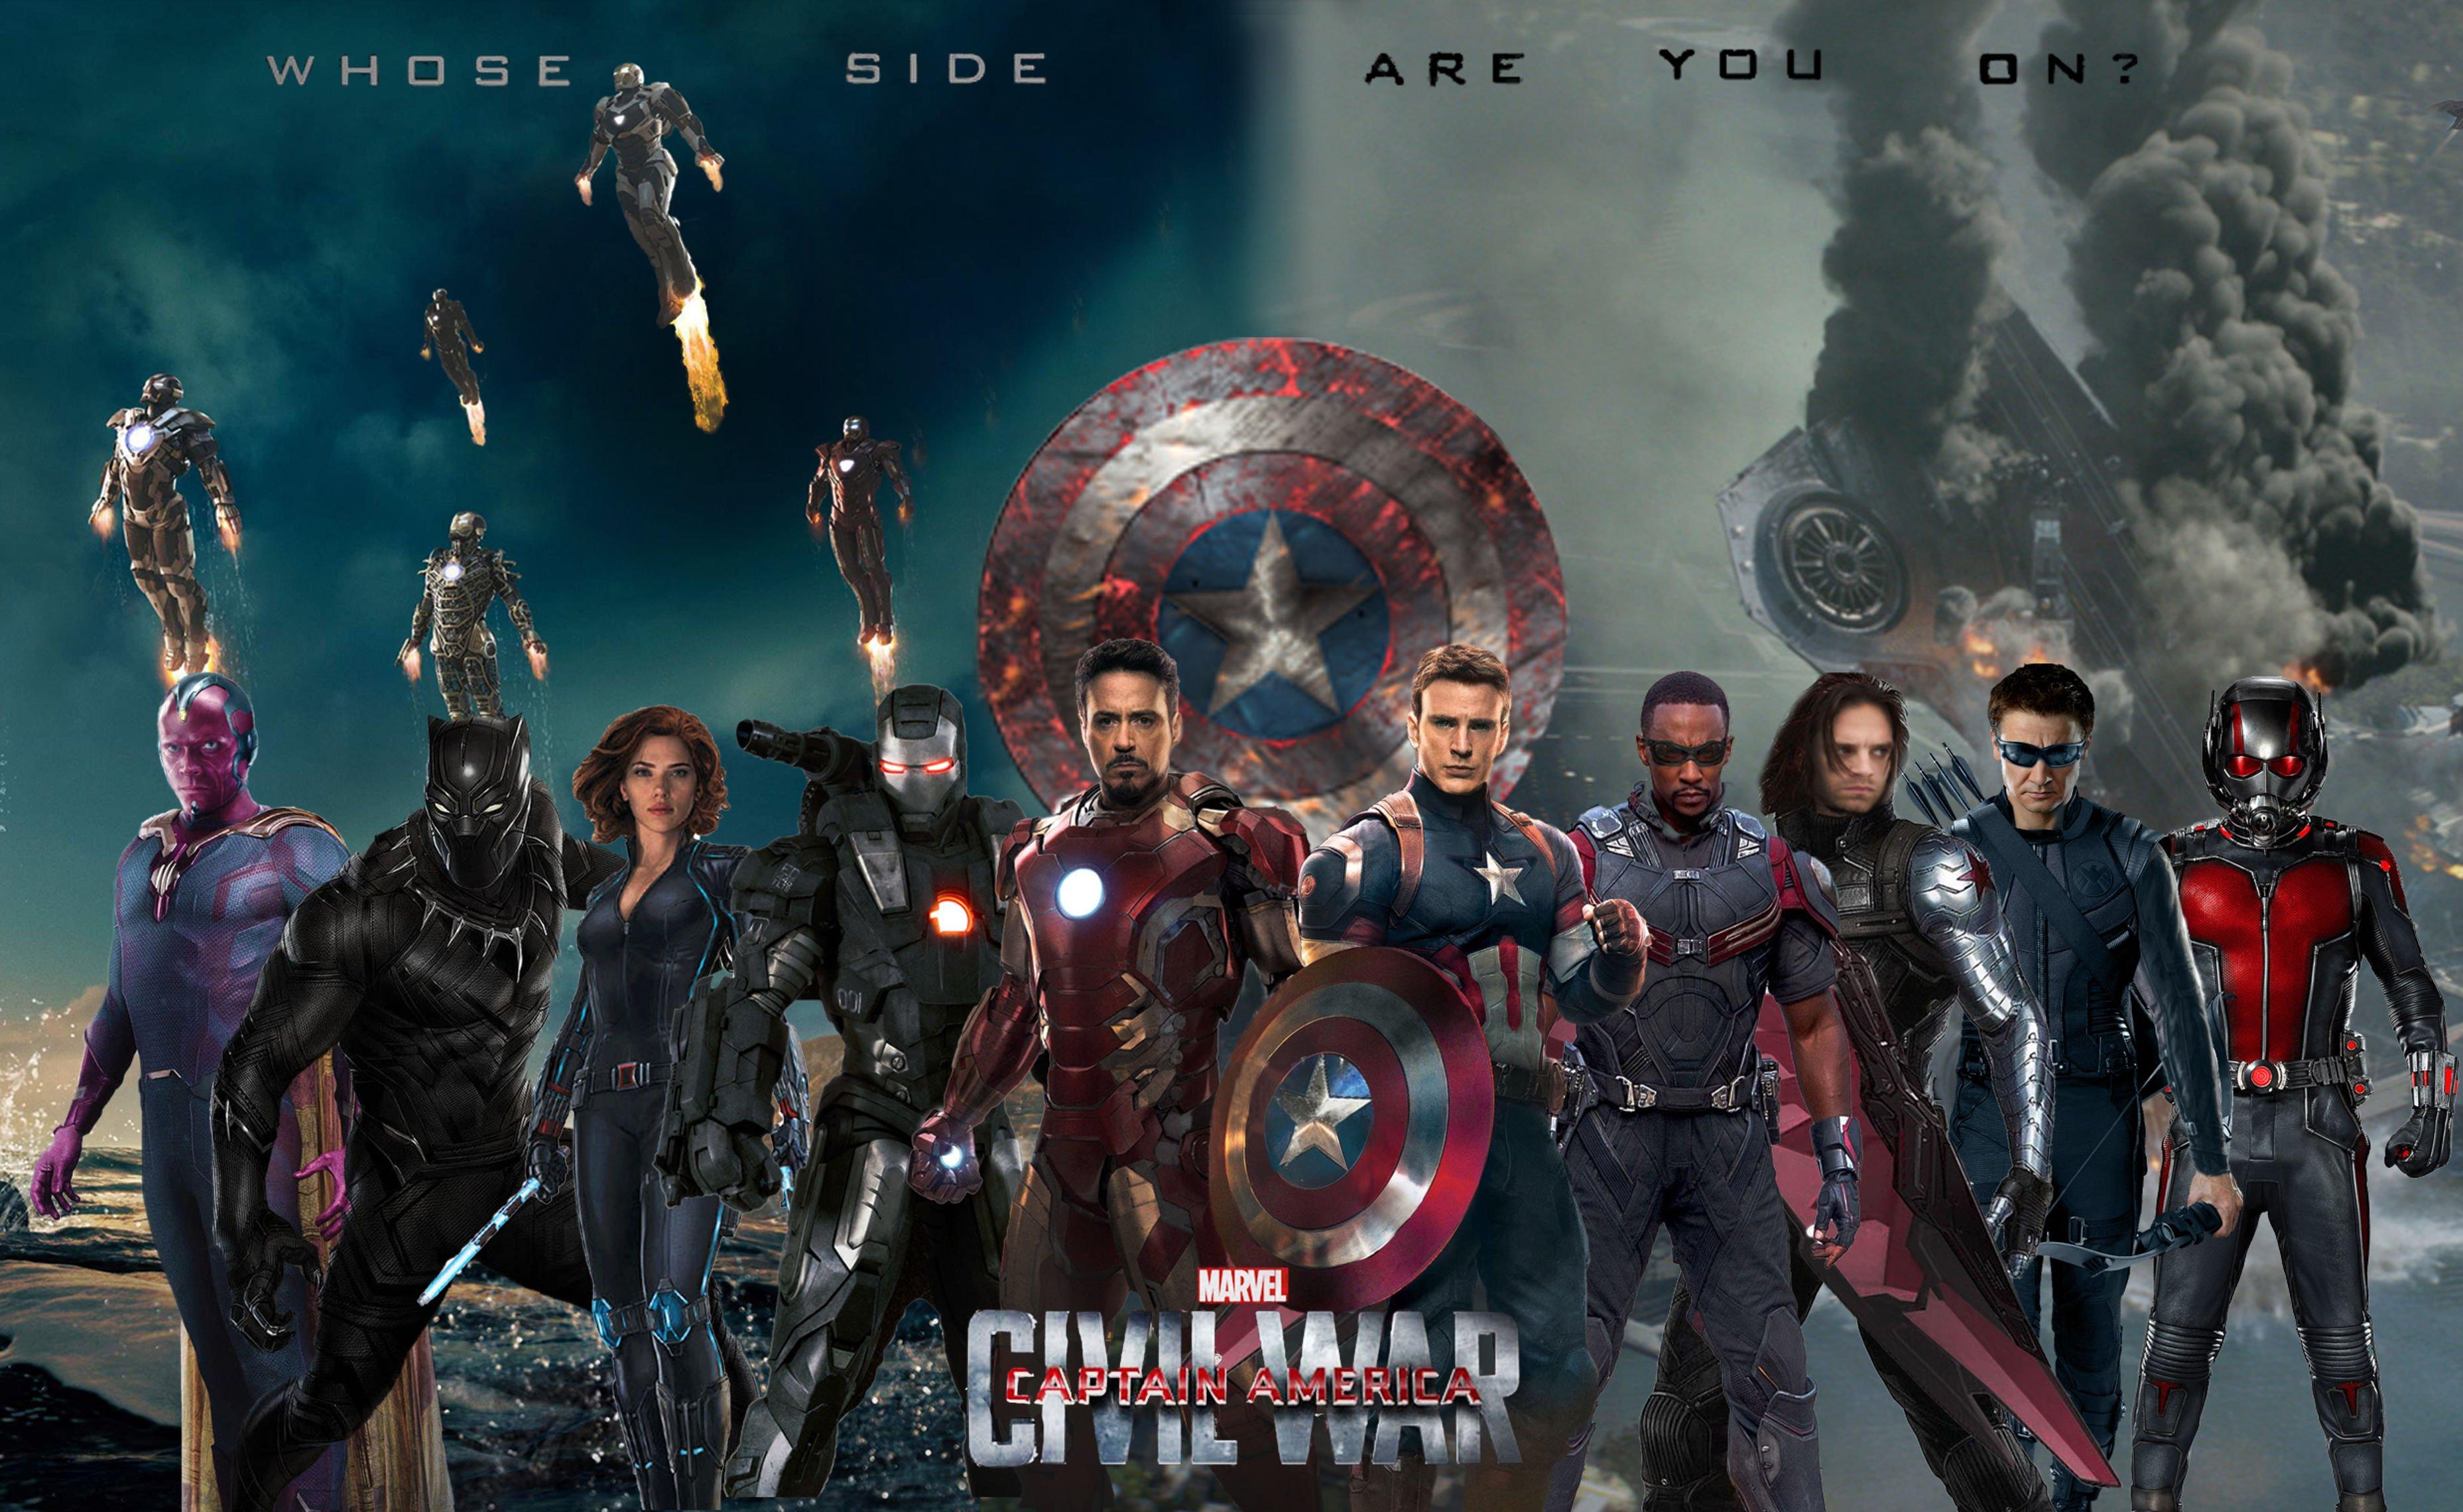 CAPTAIN AMERICA 3 Civil War marvel superhero action fighting 1cacw 3714x2280